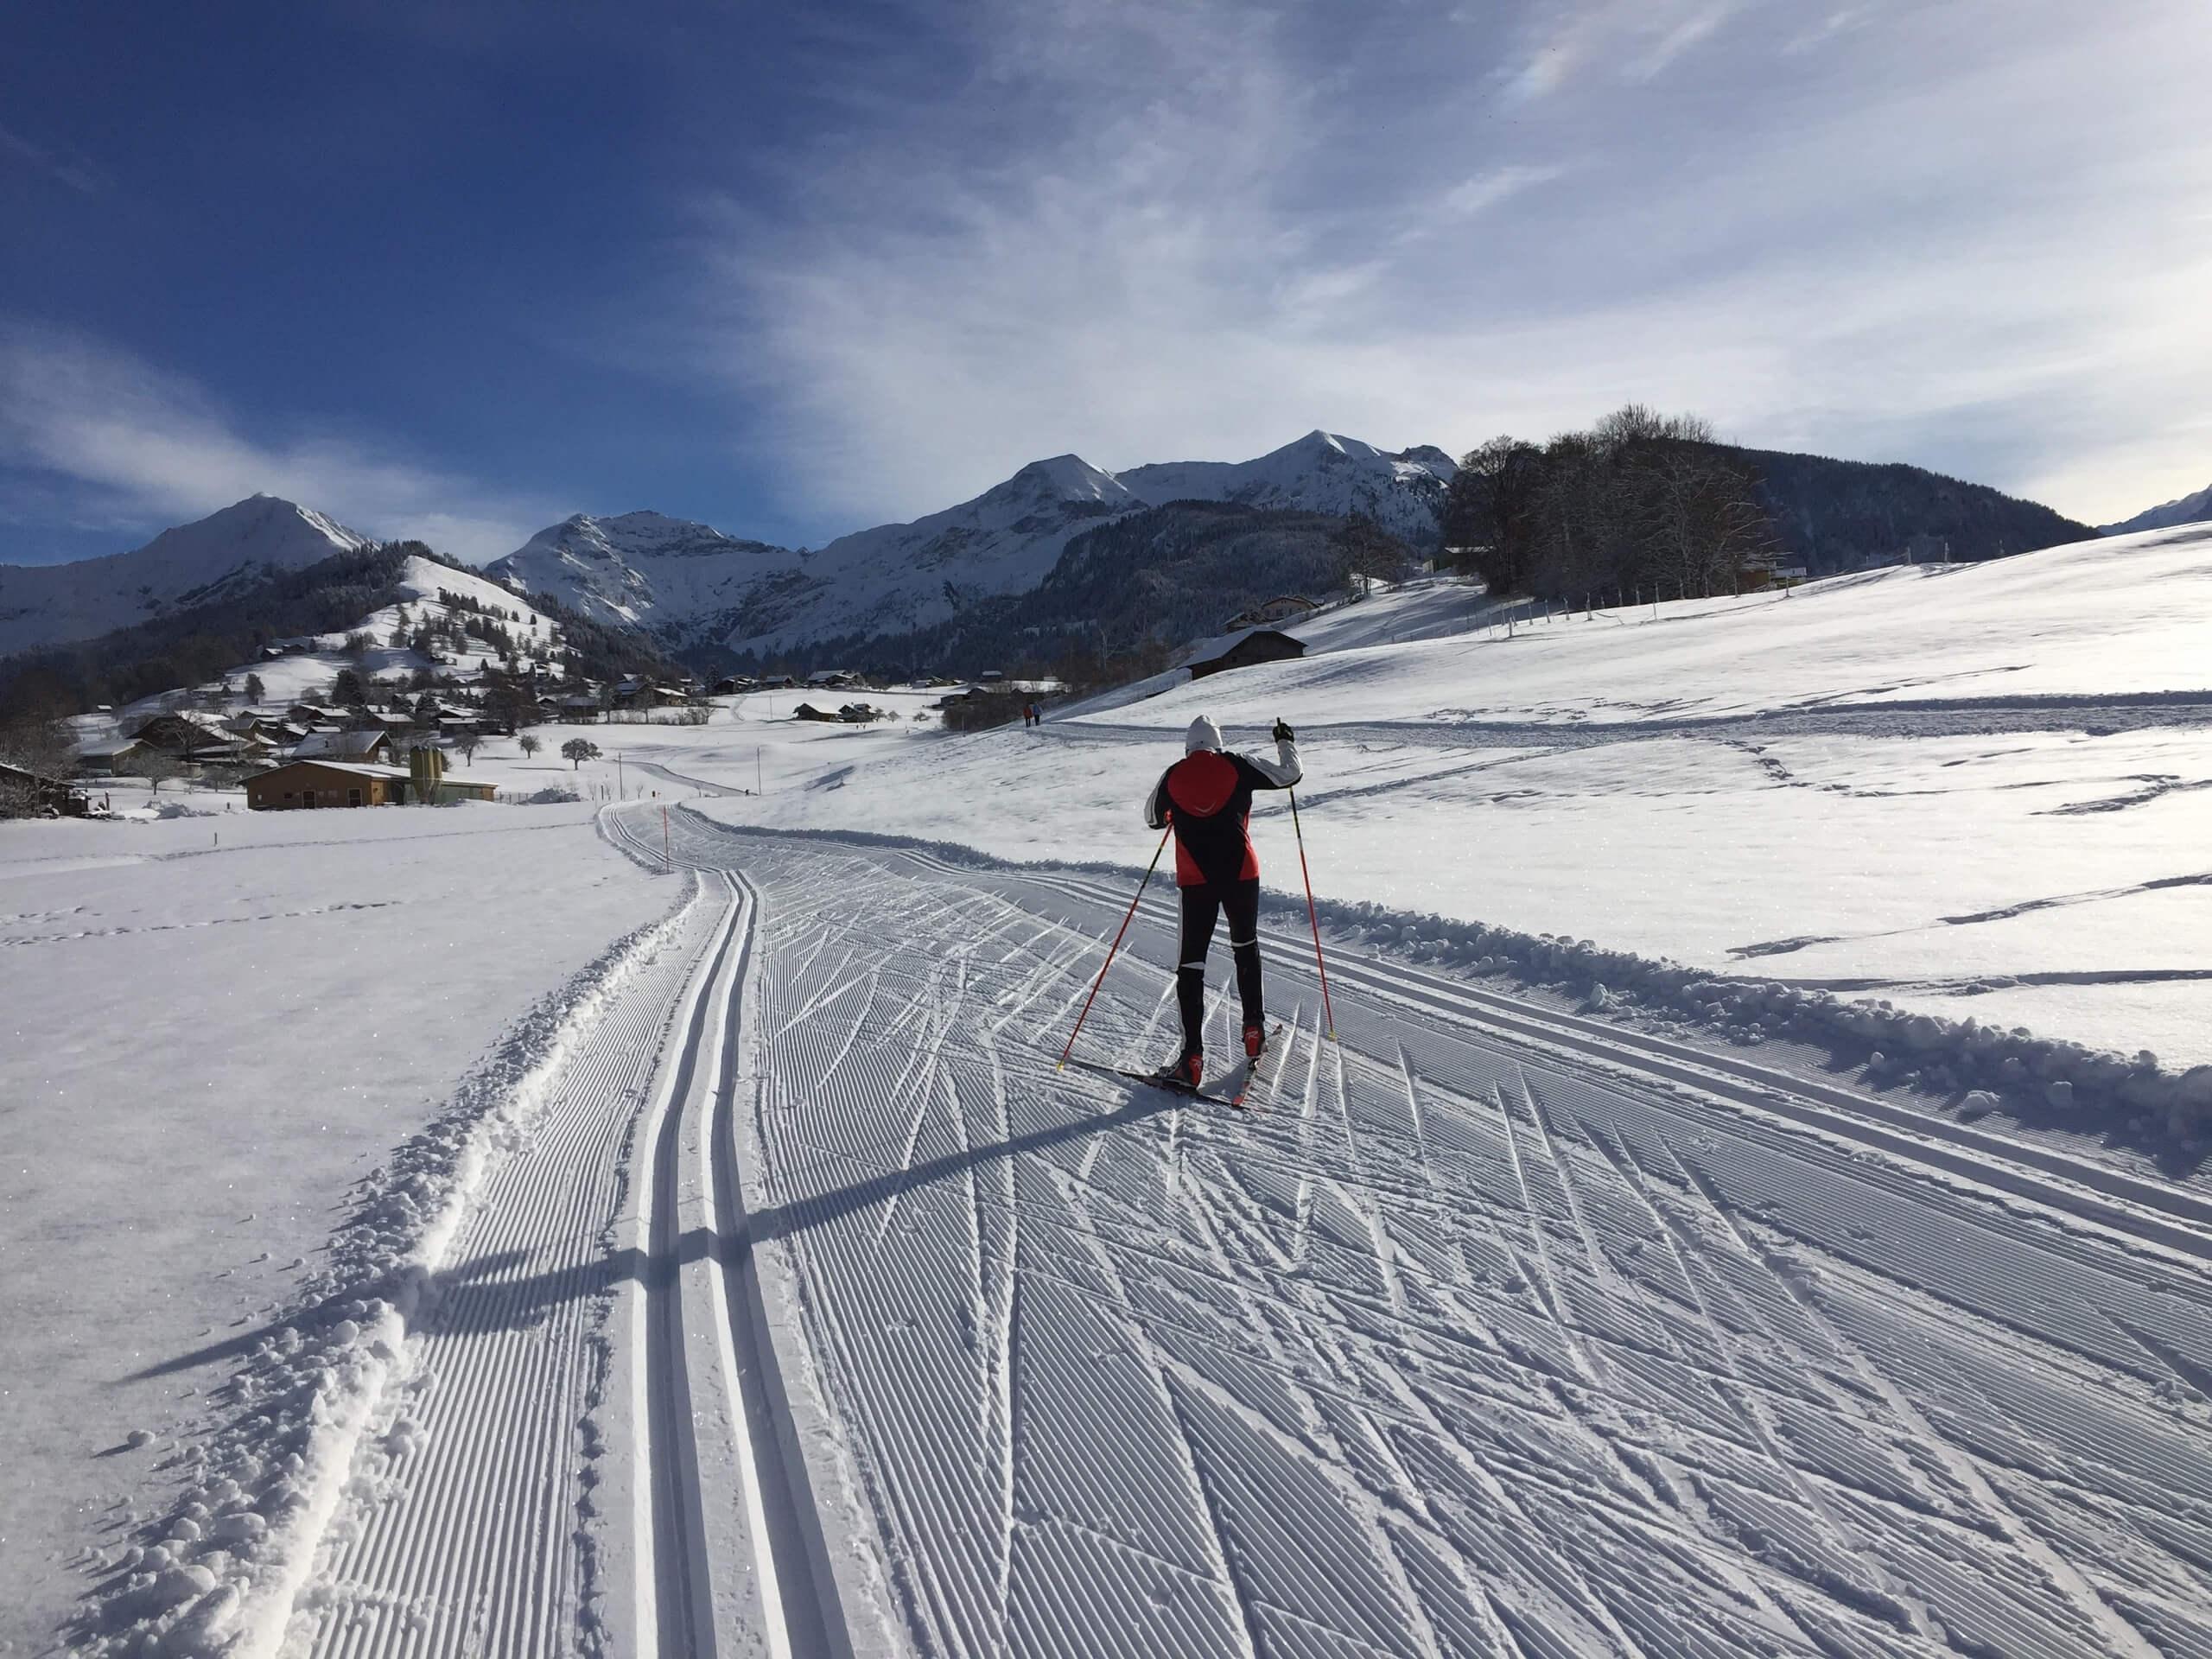 aeschi-langlauf-loipe-suldtal-winter-winteraktivitaet